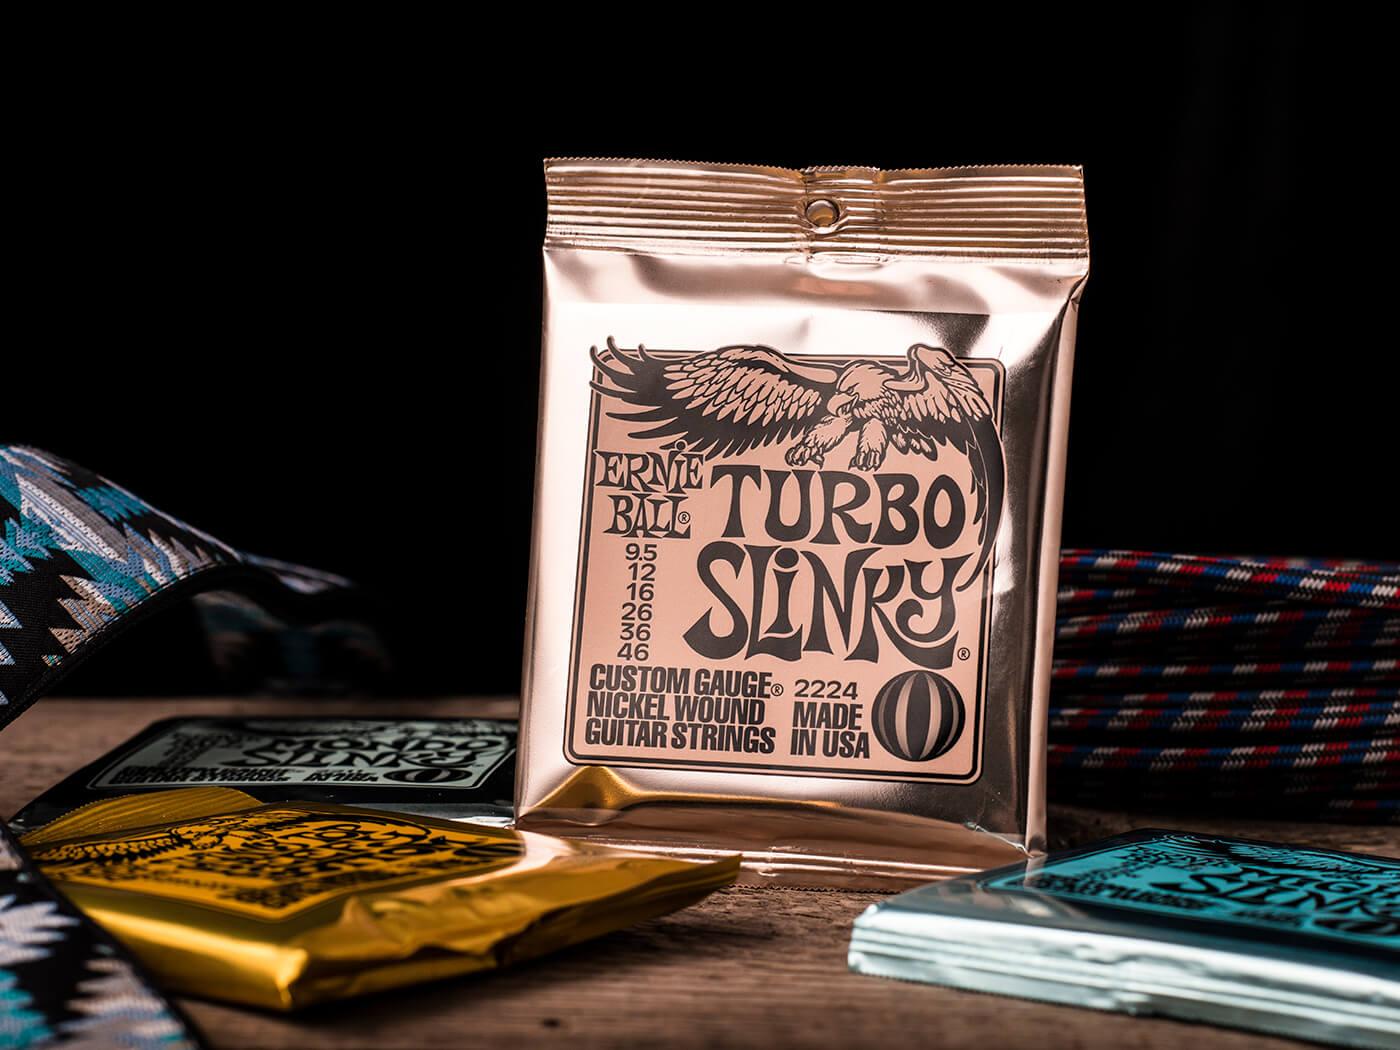 Ernie Ball Turbo Slinky